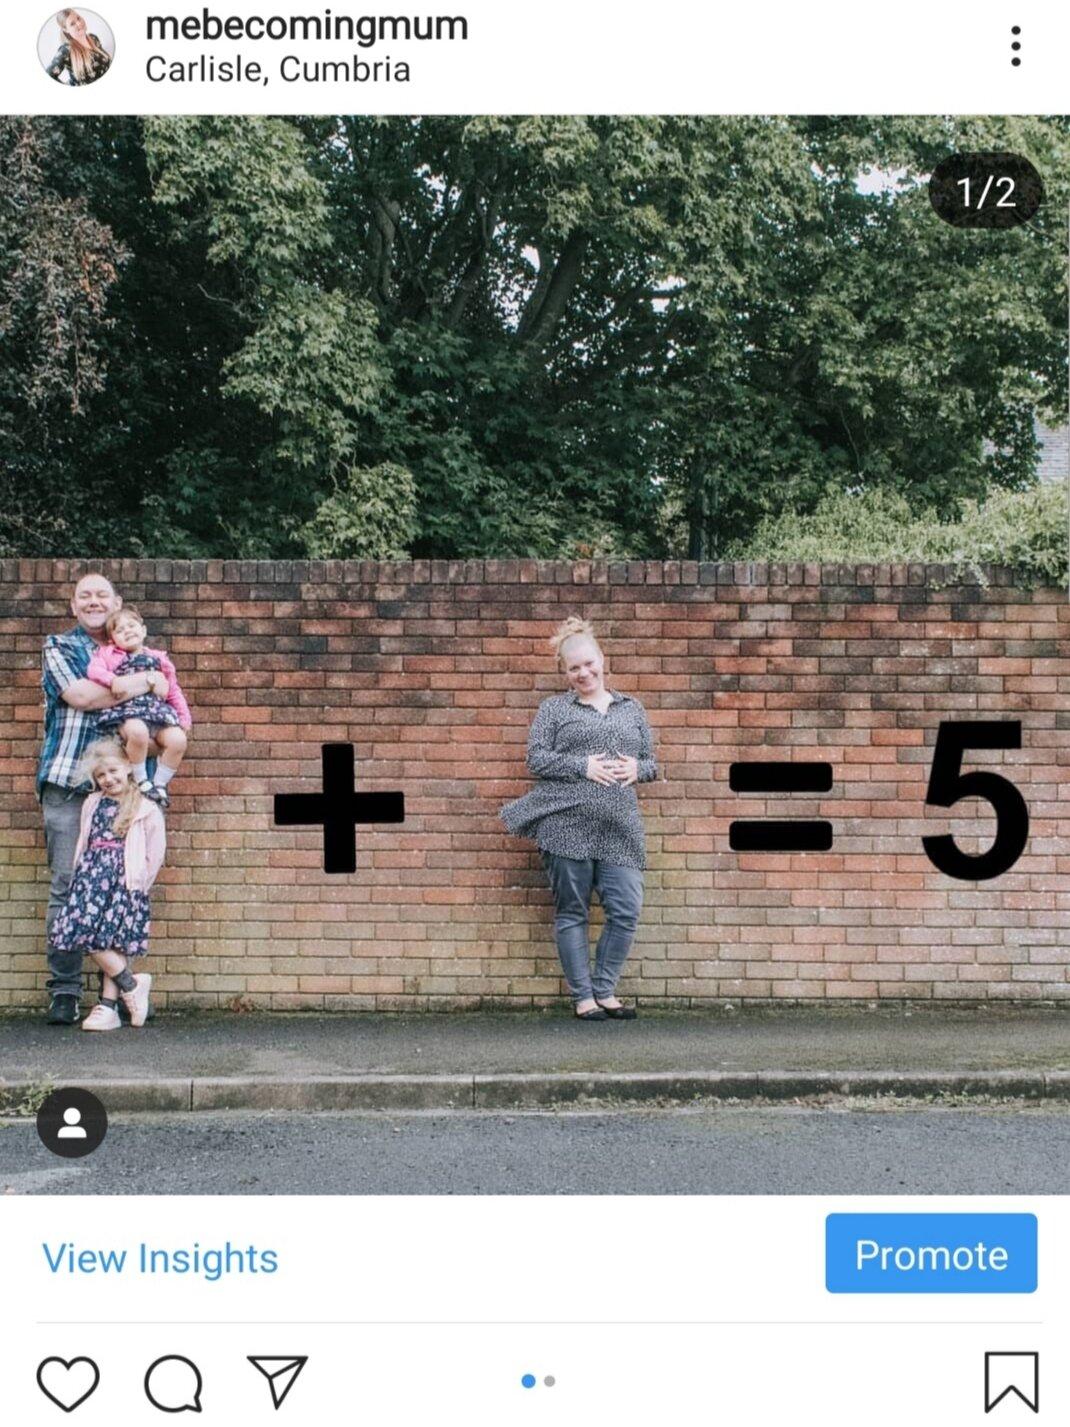 Instagram pregnancy announcement